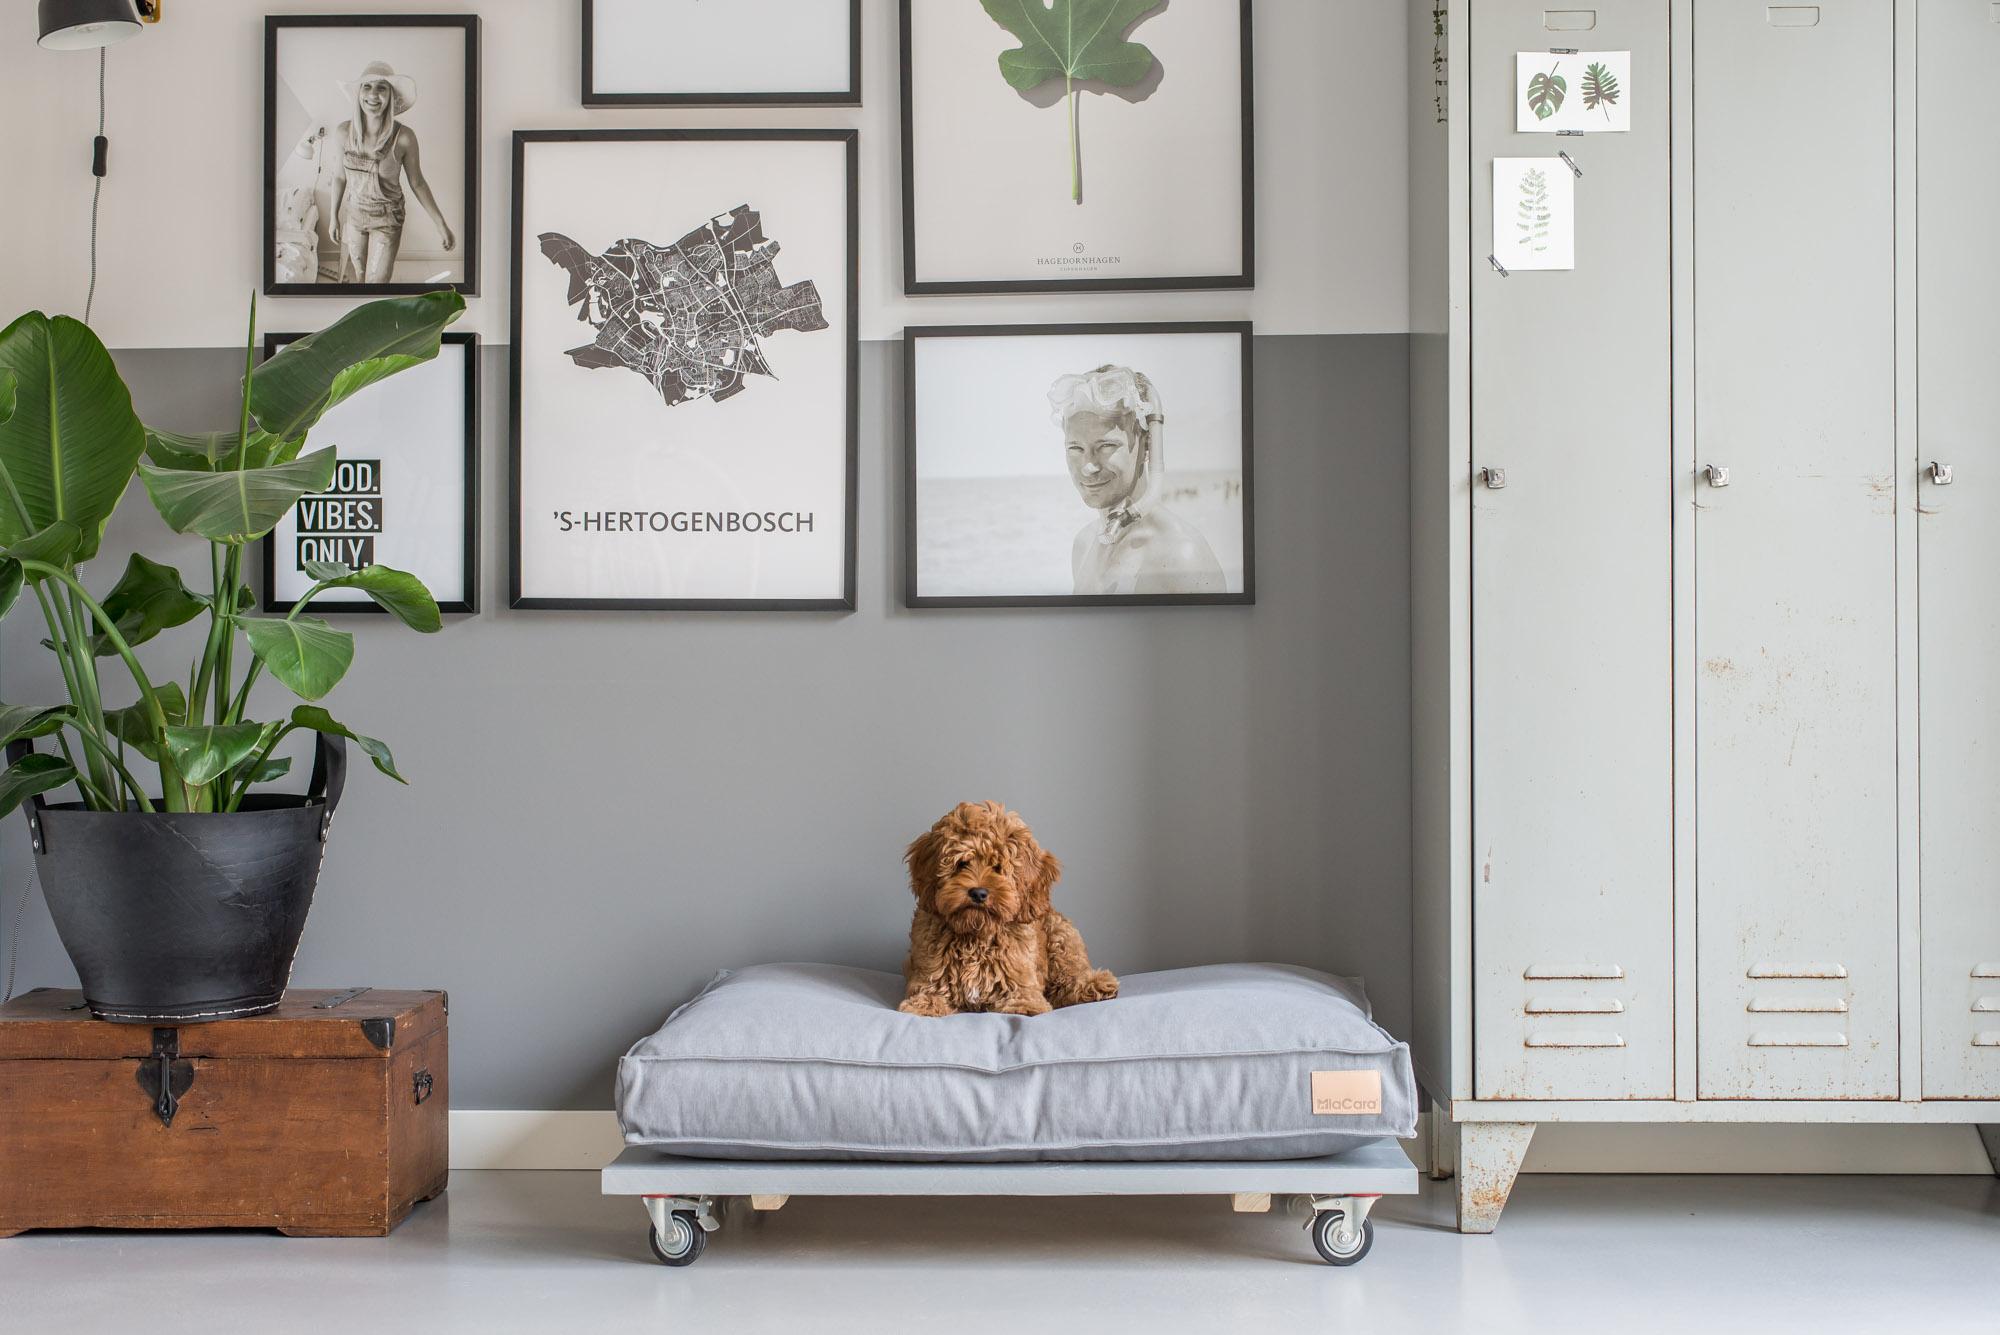 Steigerhouten hondenmand zelf maken remade with love for Bouwtekening hoekbank